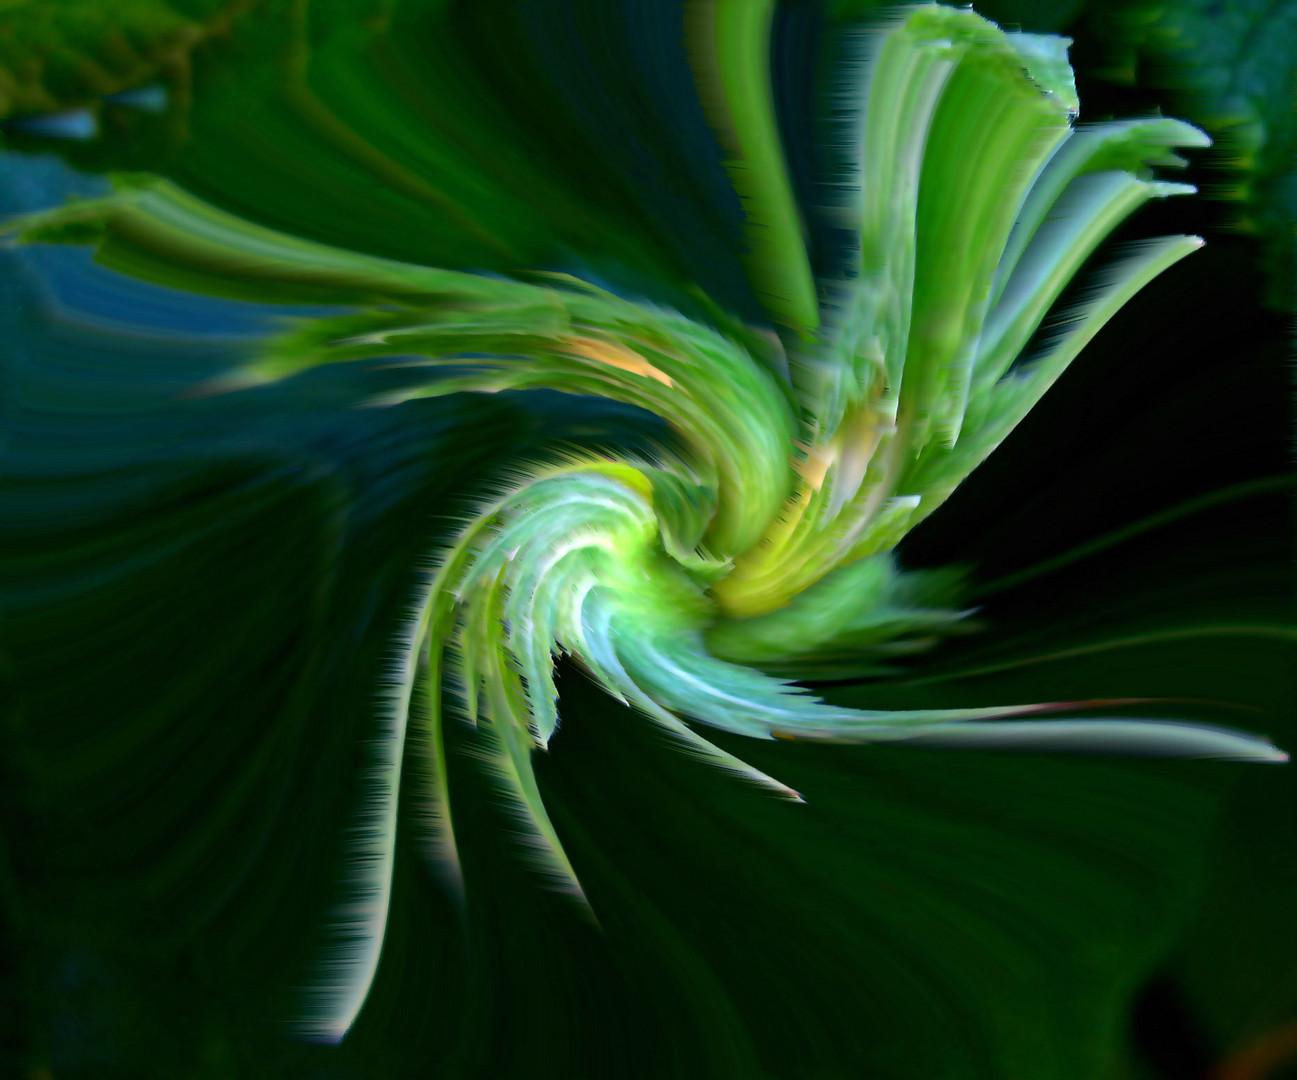 Grüne Ausstrahlung